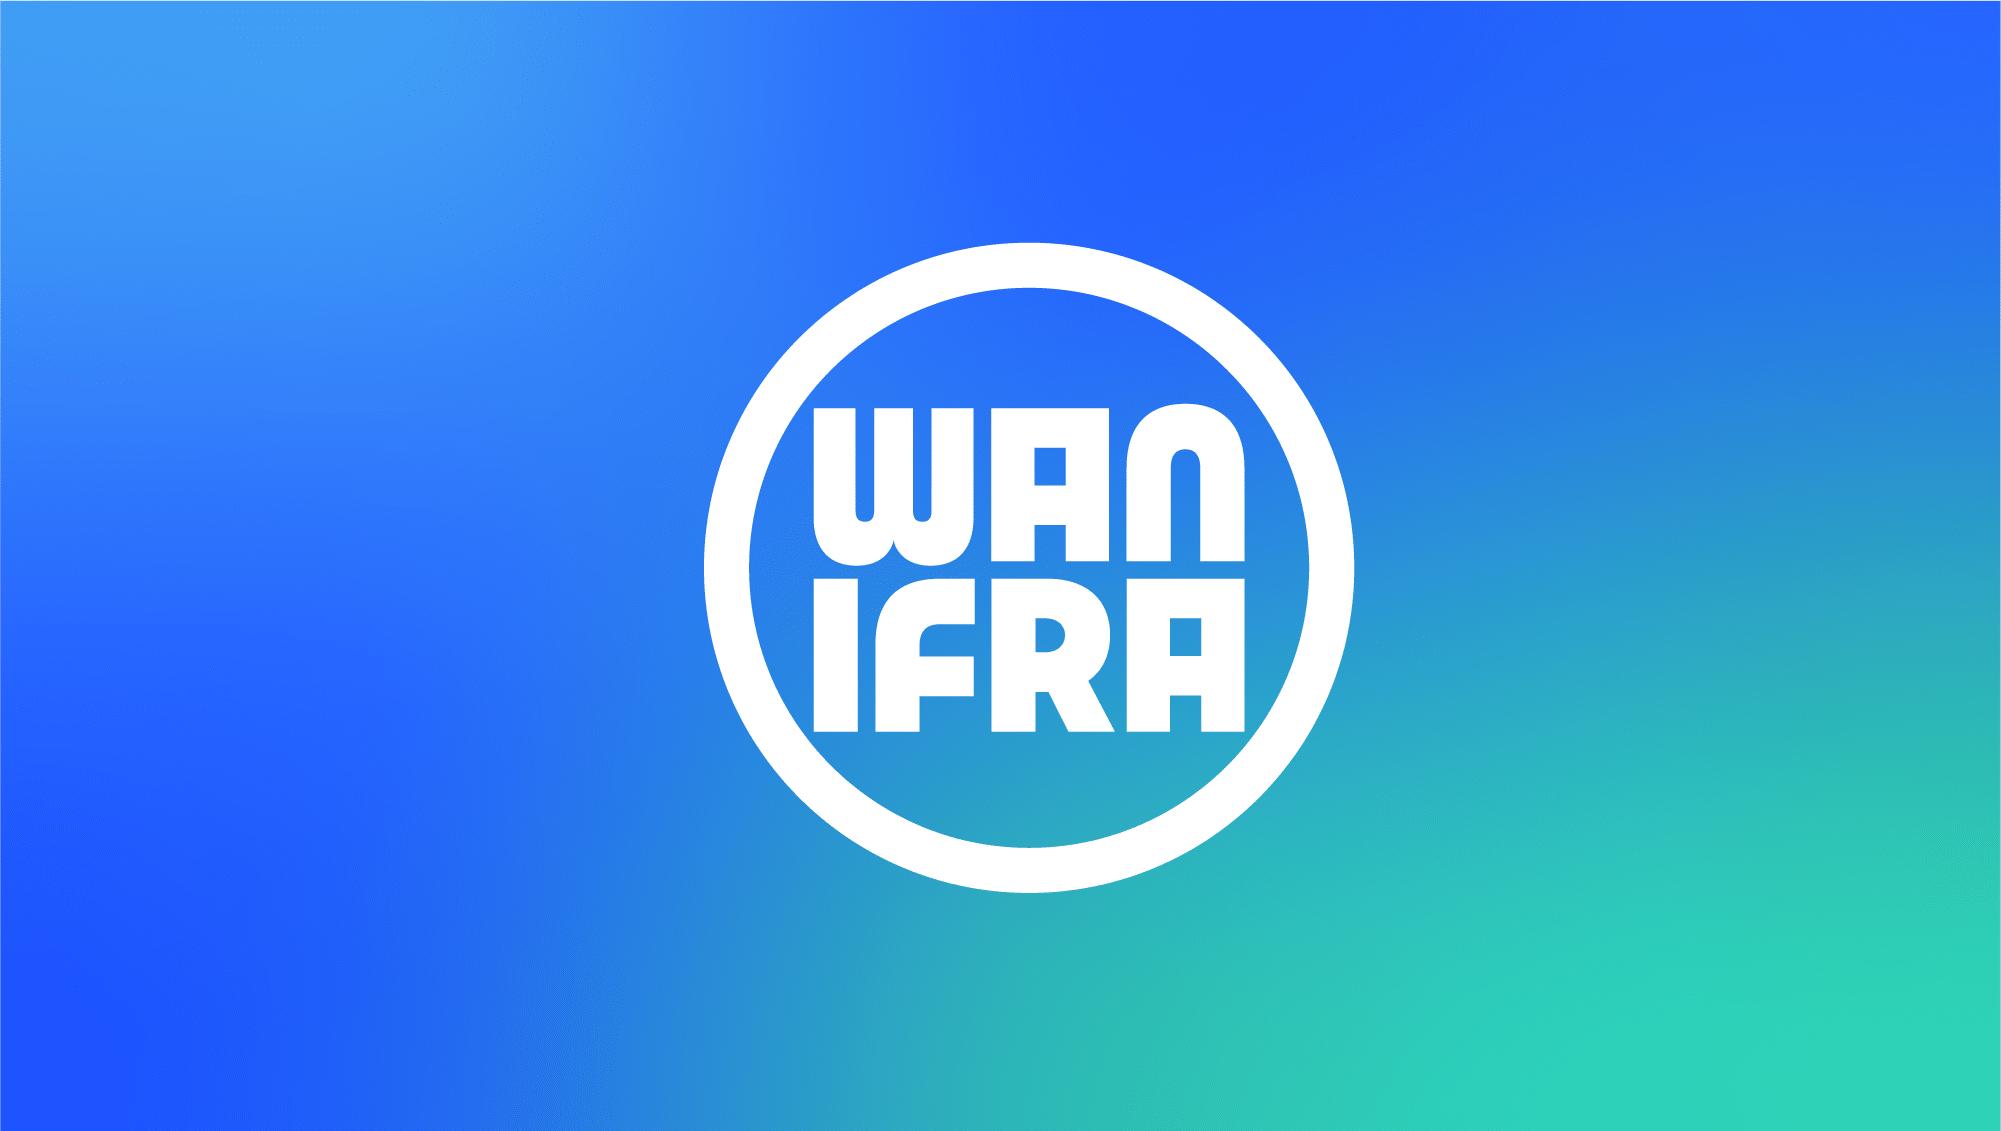 Wan Ifra